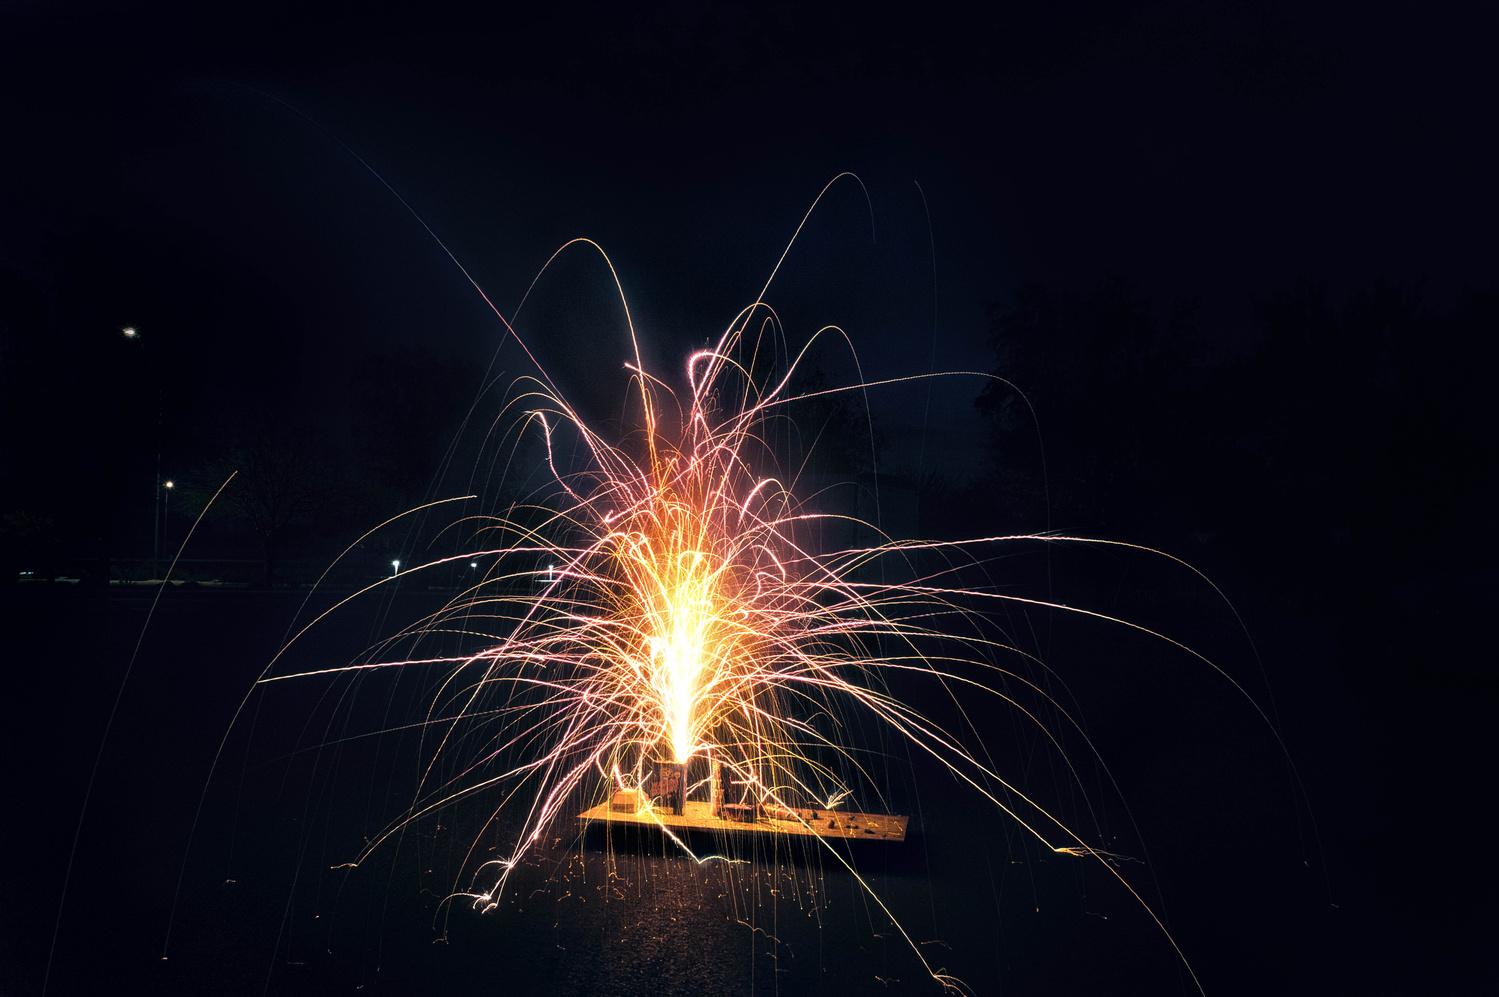 Humble Fireworks by Matt Rogers